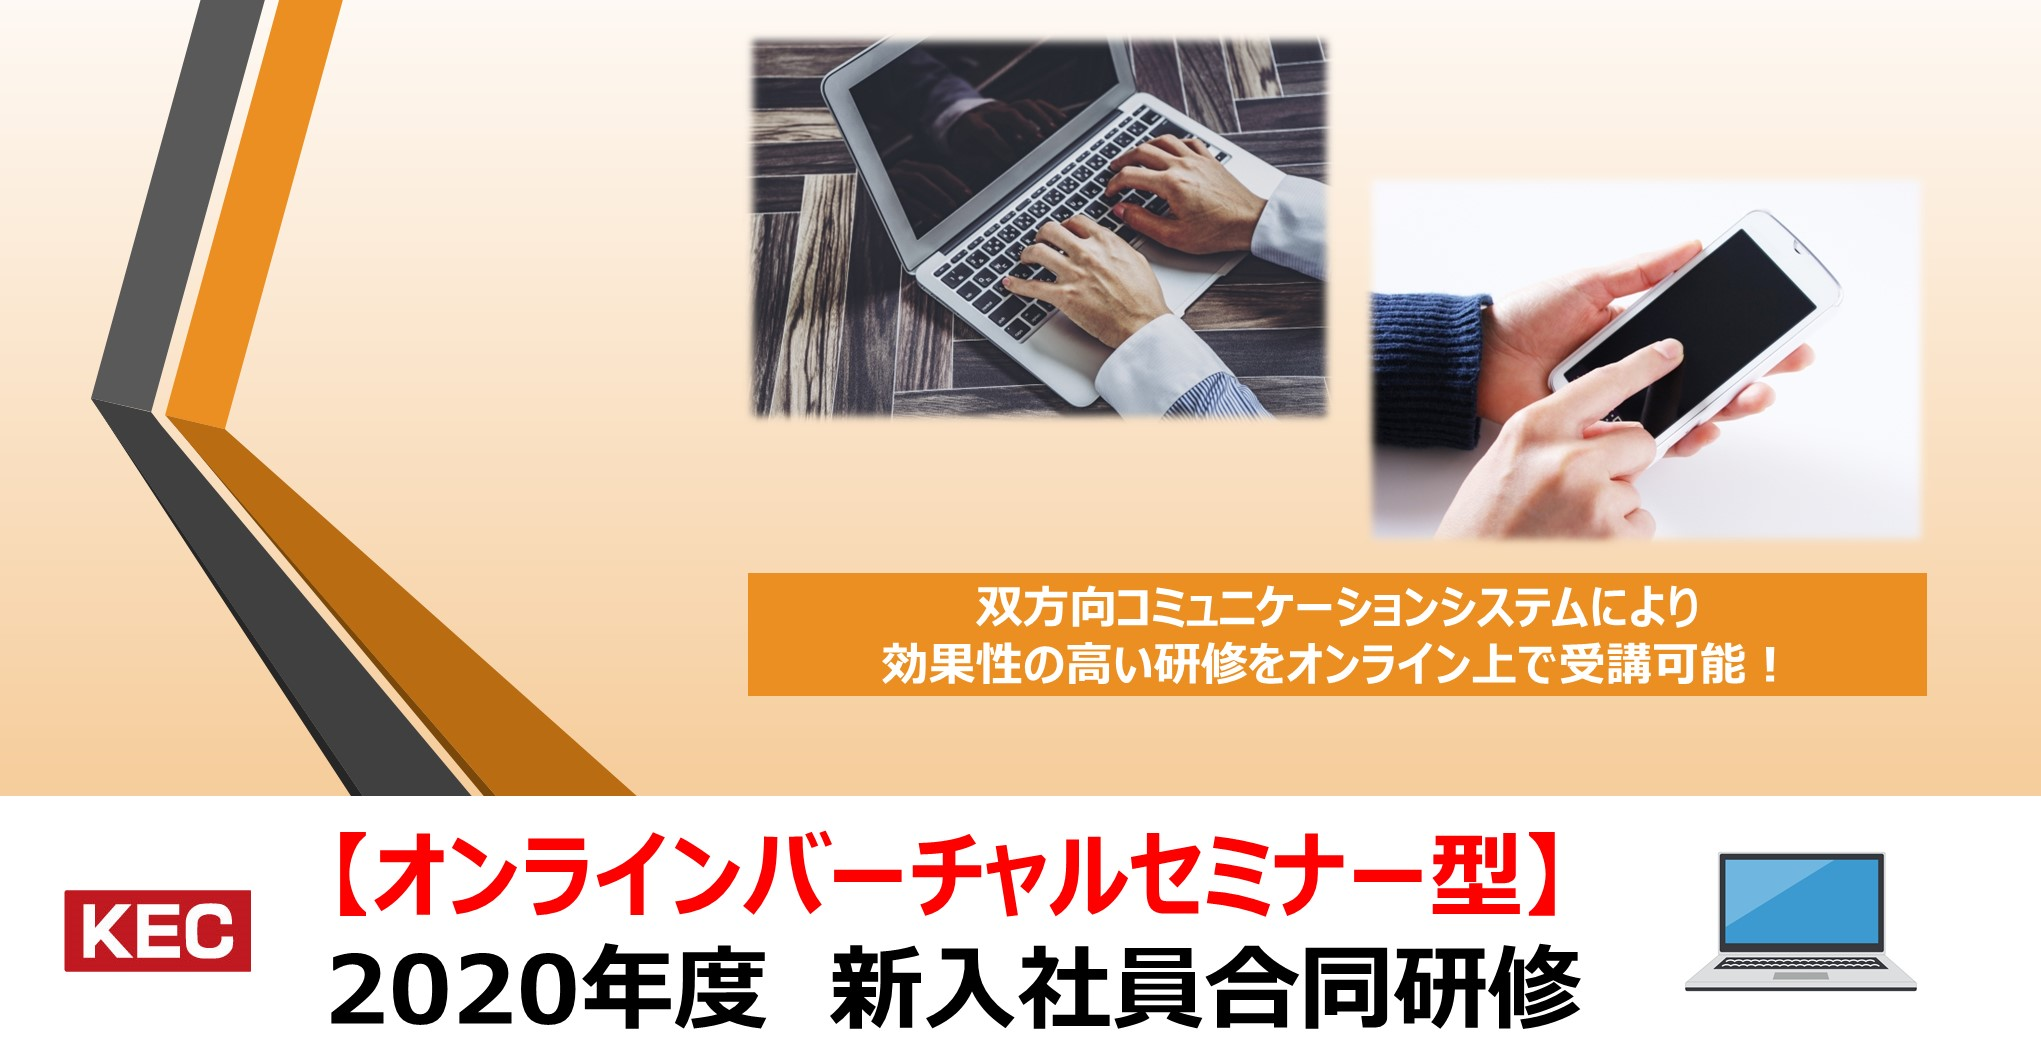 https://www.consul.kec.ne.jp/wp/wp-content/uploads/2020/04/540-280-online-2.jpg